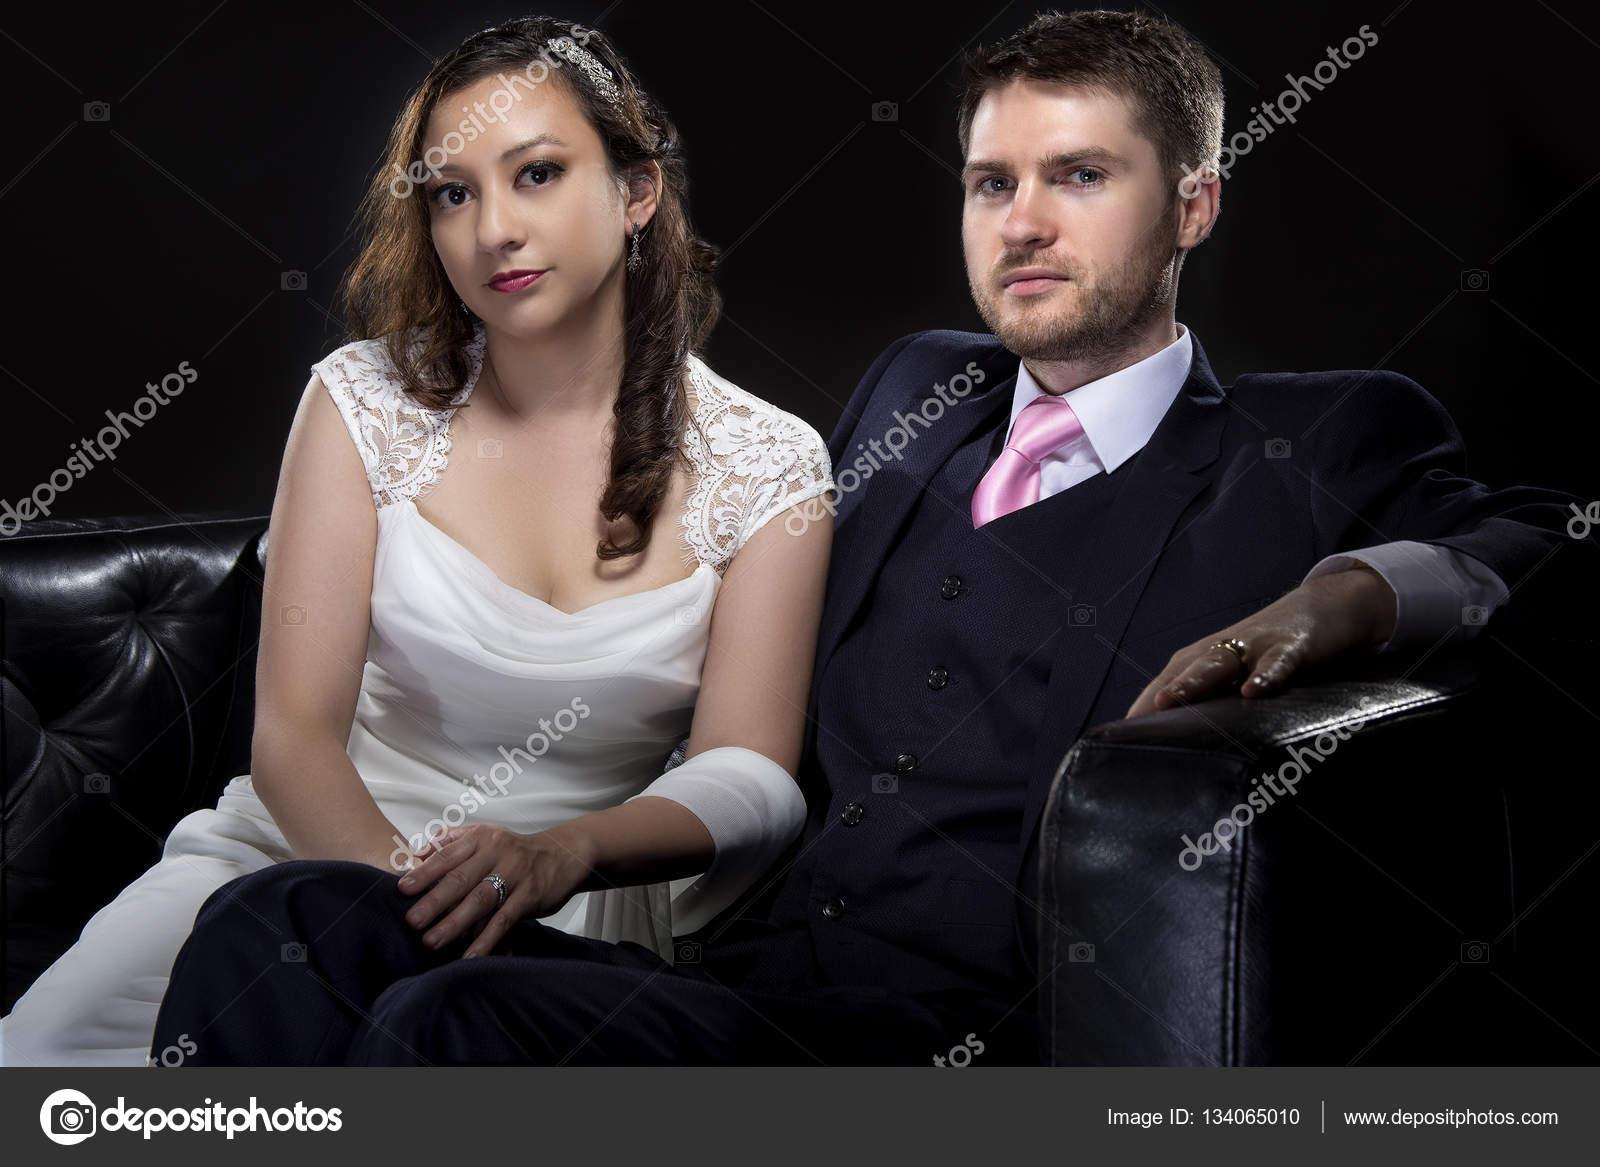 pareja modelos de vestido de novia y traje de boda con estilo u foto de stock